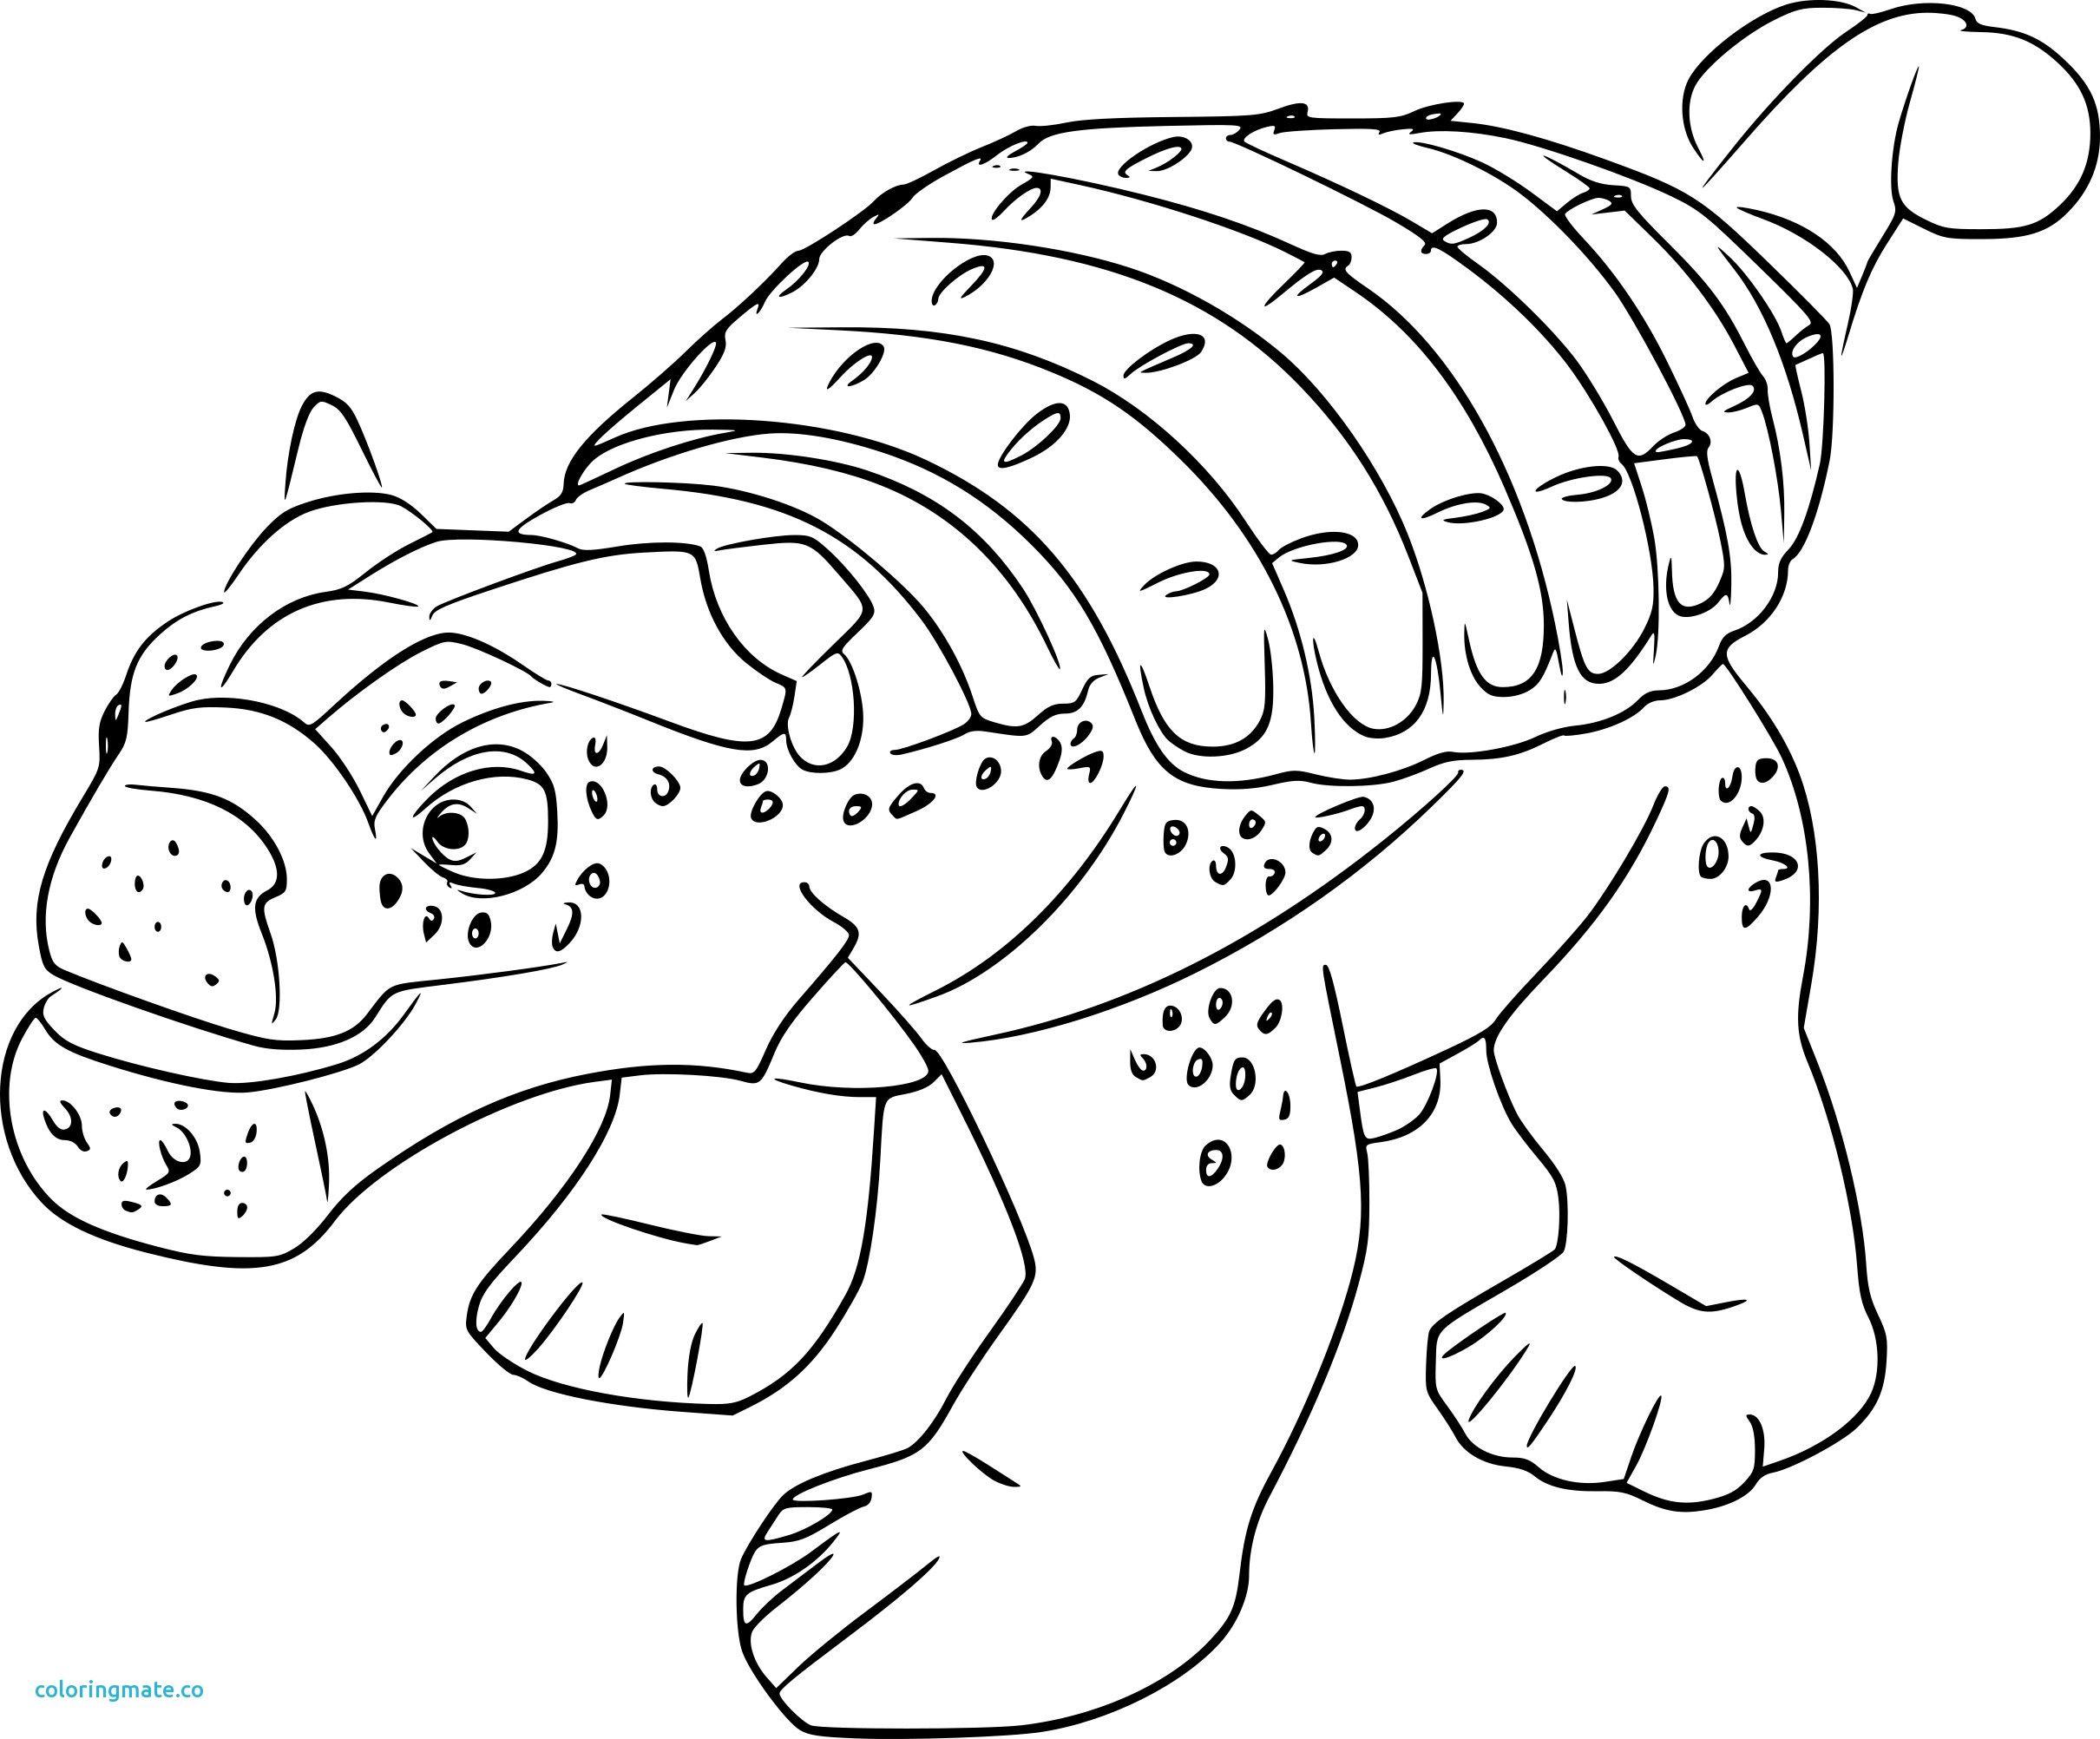 Coloriage ankylosaurus dinosaure a imprimer of coloriage mandala dinosaure dino character - Dinausore dessin ...